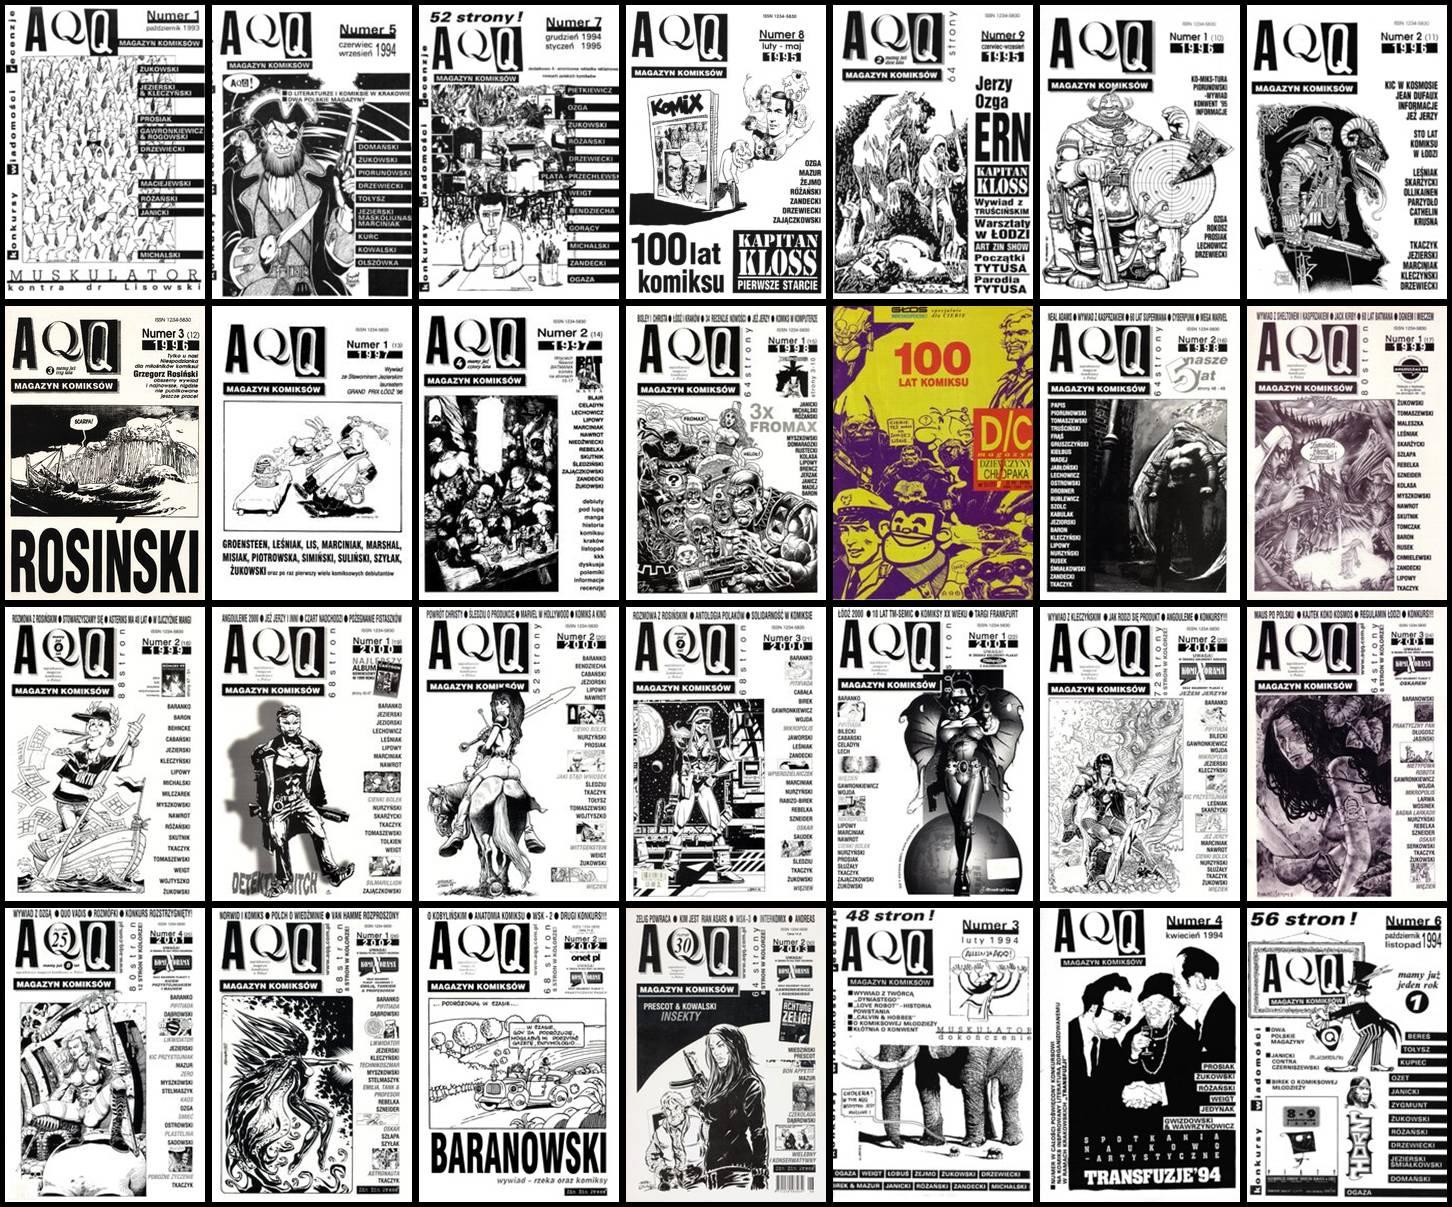 AQQ Magazyn Komiksowy #1-31 + Dodatek 100 lat komiksu